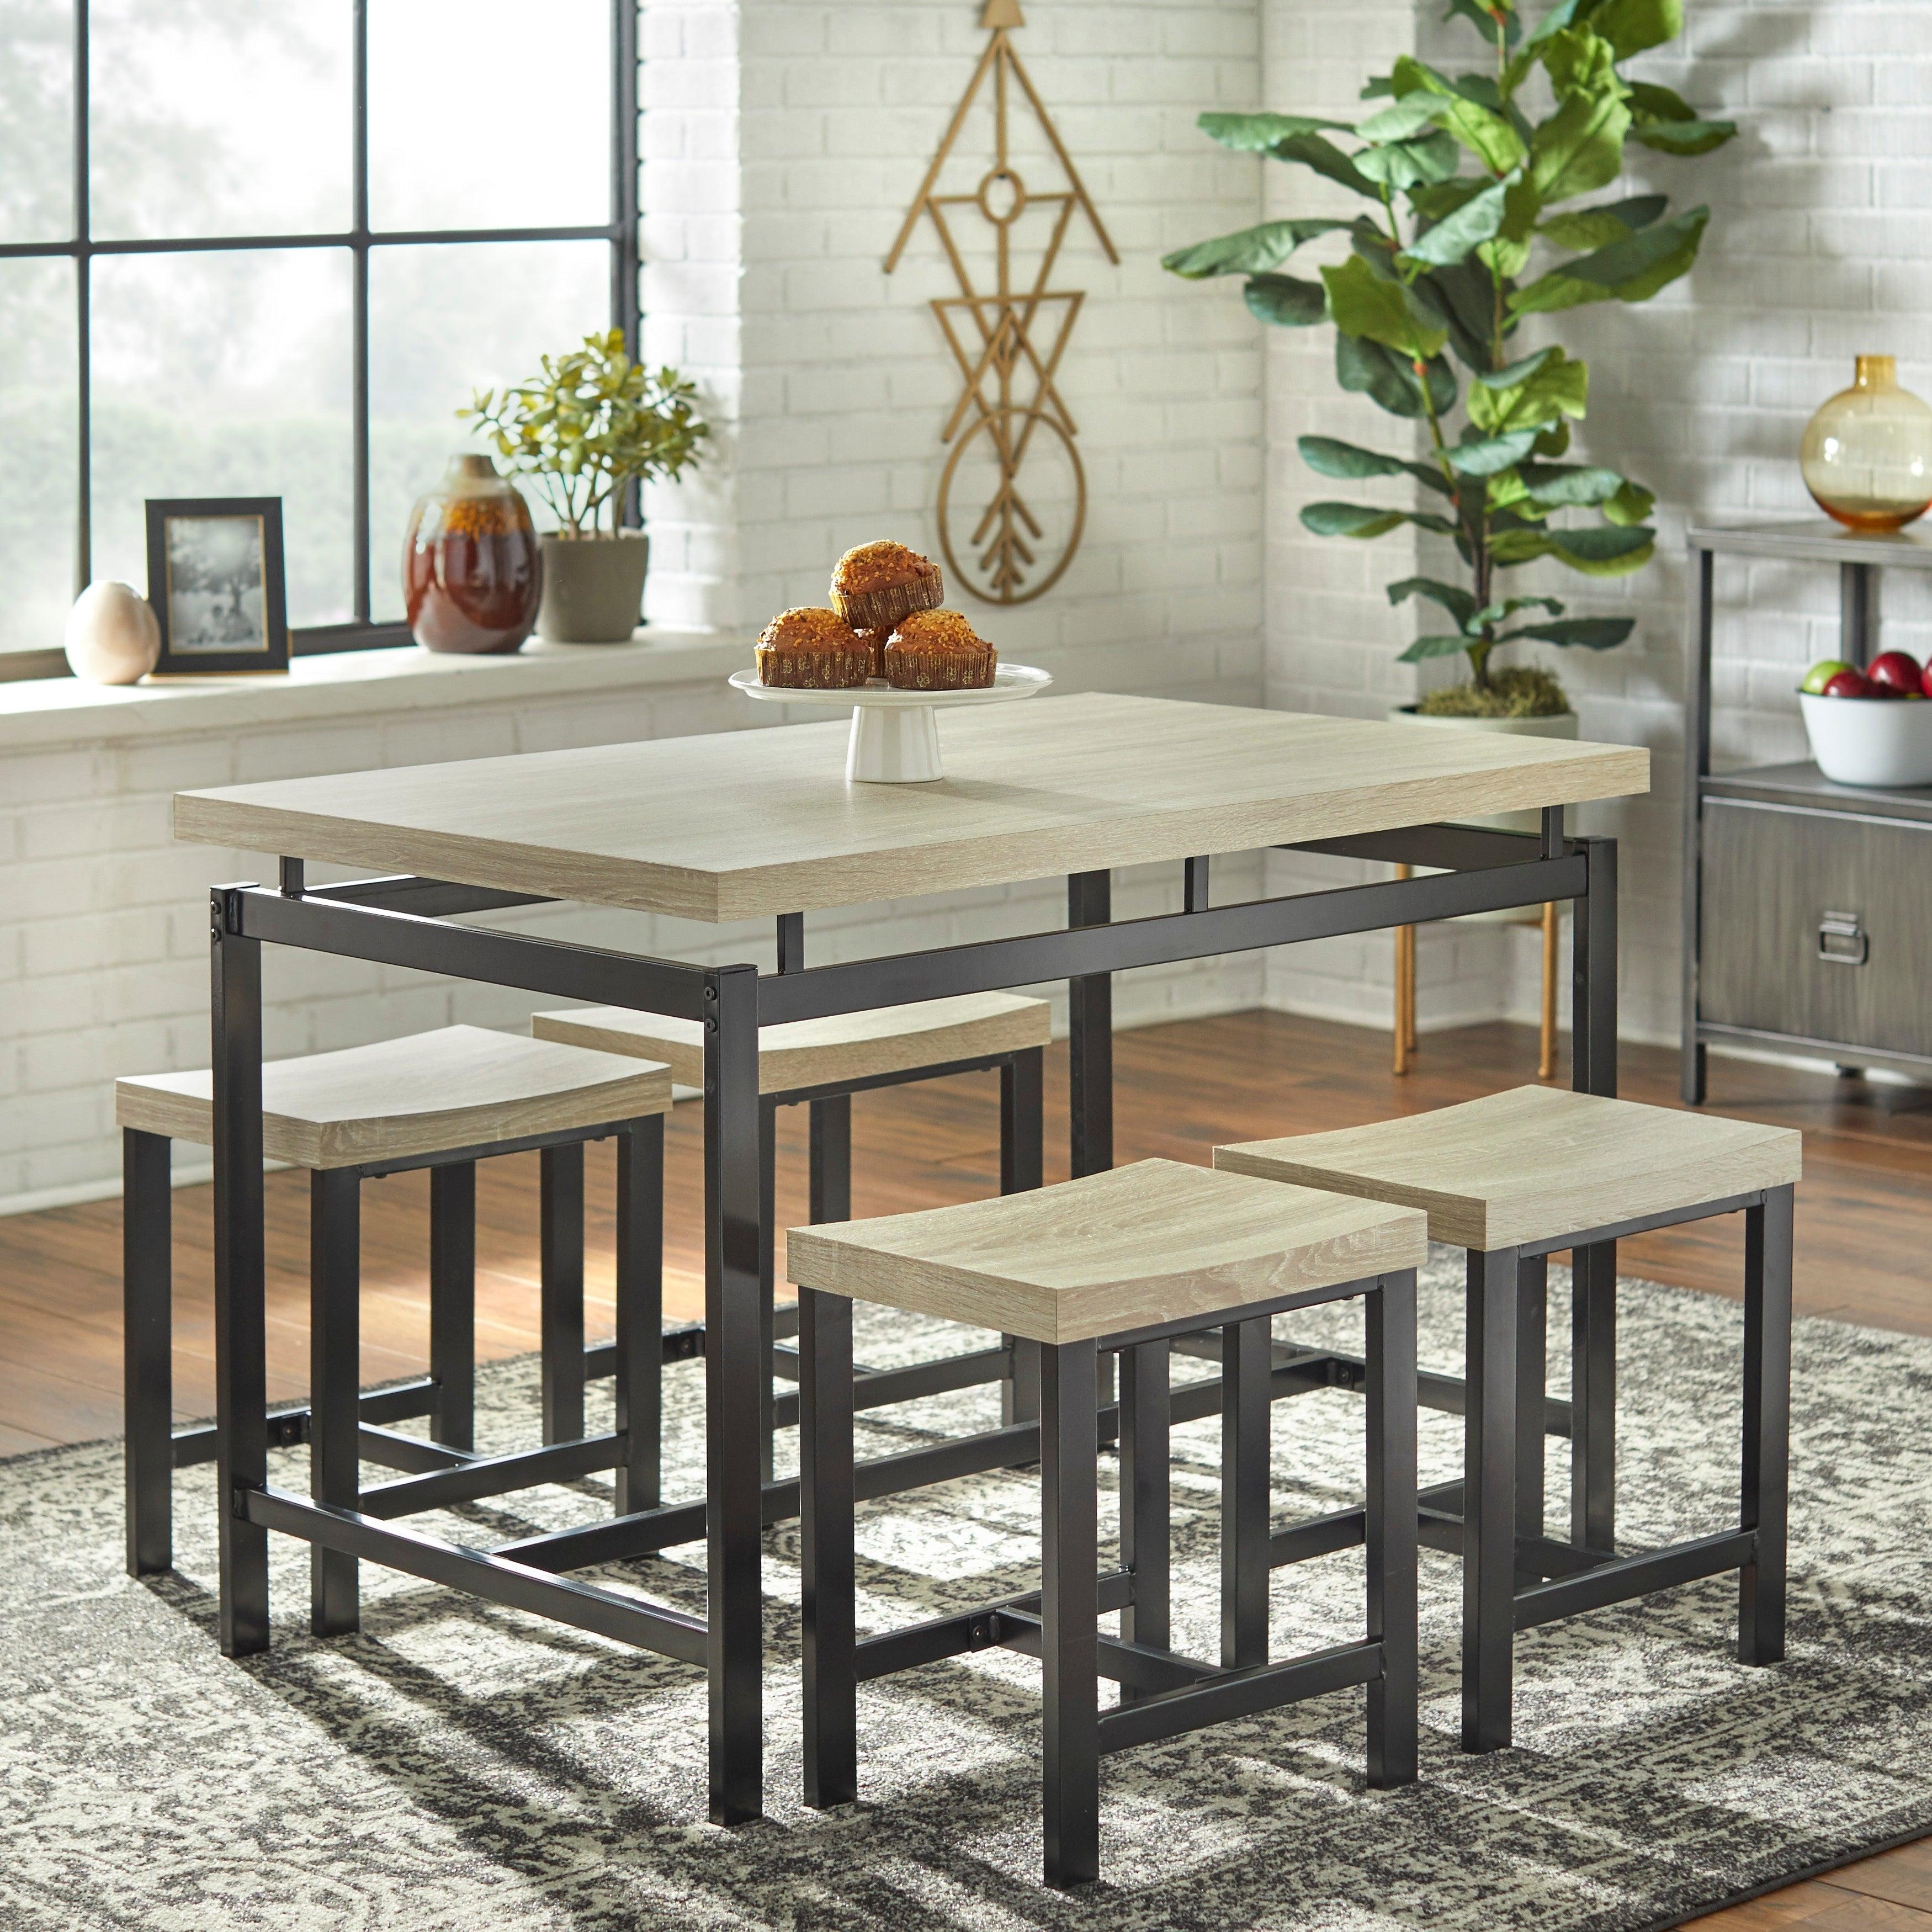 Buy Kitchen & Dining Room Sets Online at Overstock.com | Our Best ...